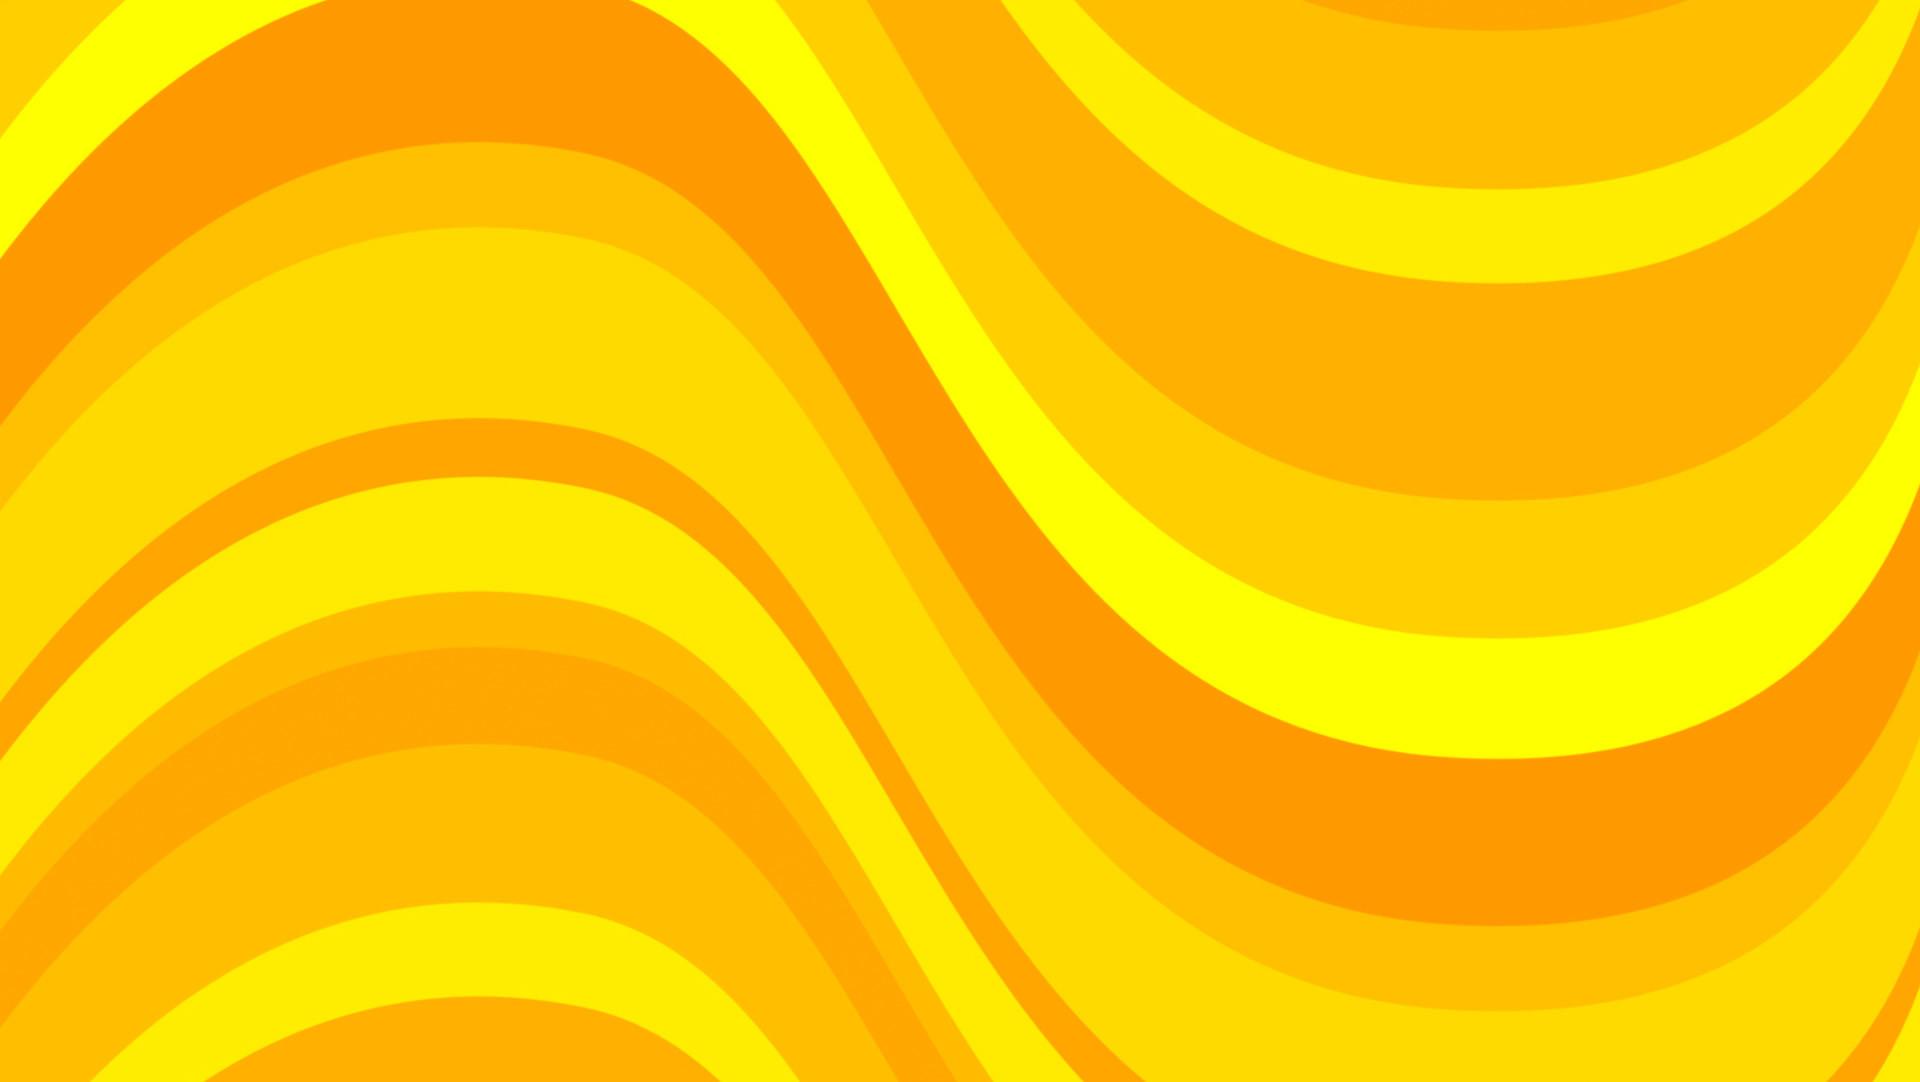 Black And Yellow Abstract Wallpaper 5 Hd Wallpaper. Black And Yellow  Abstract Wallpaper 5 Hd Wallpaper